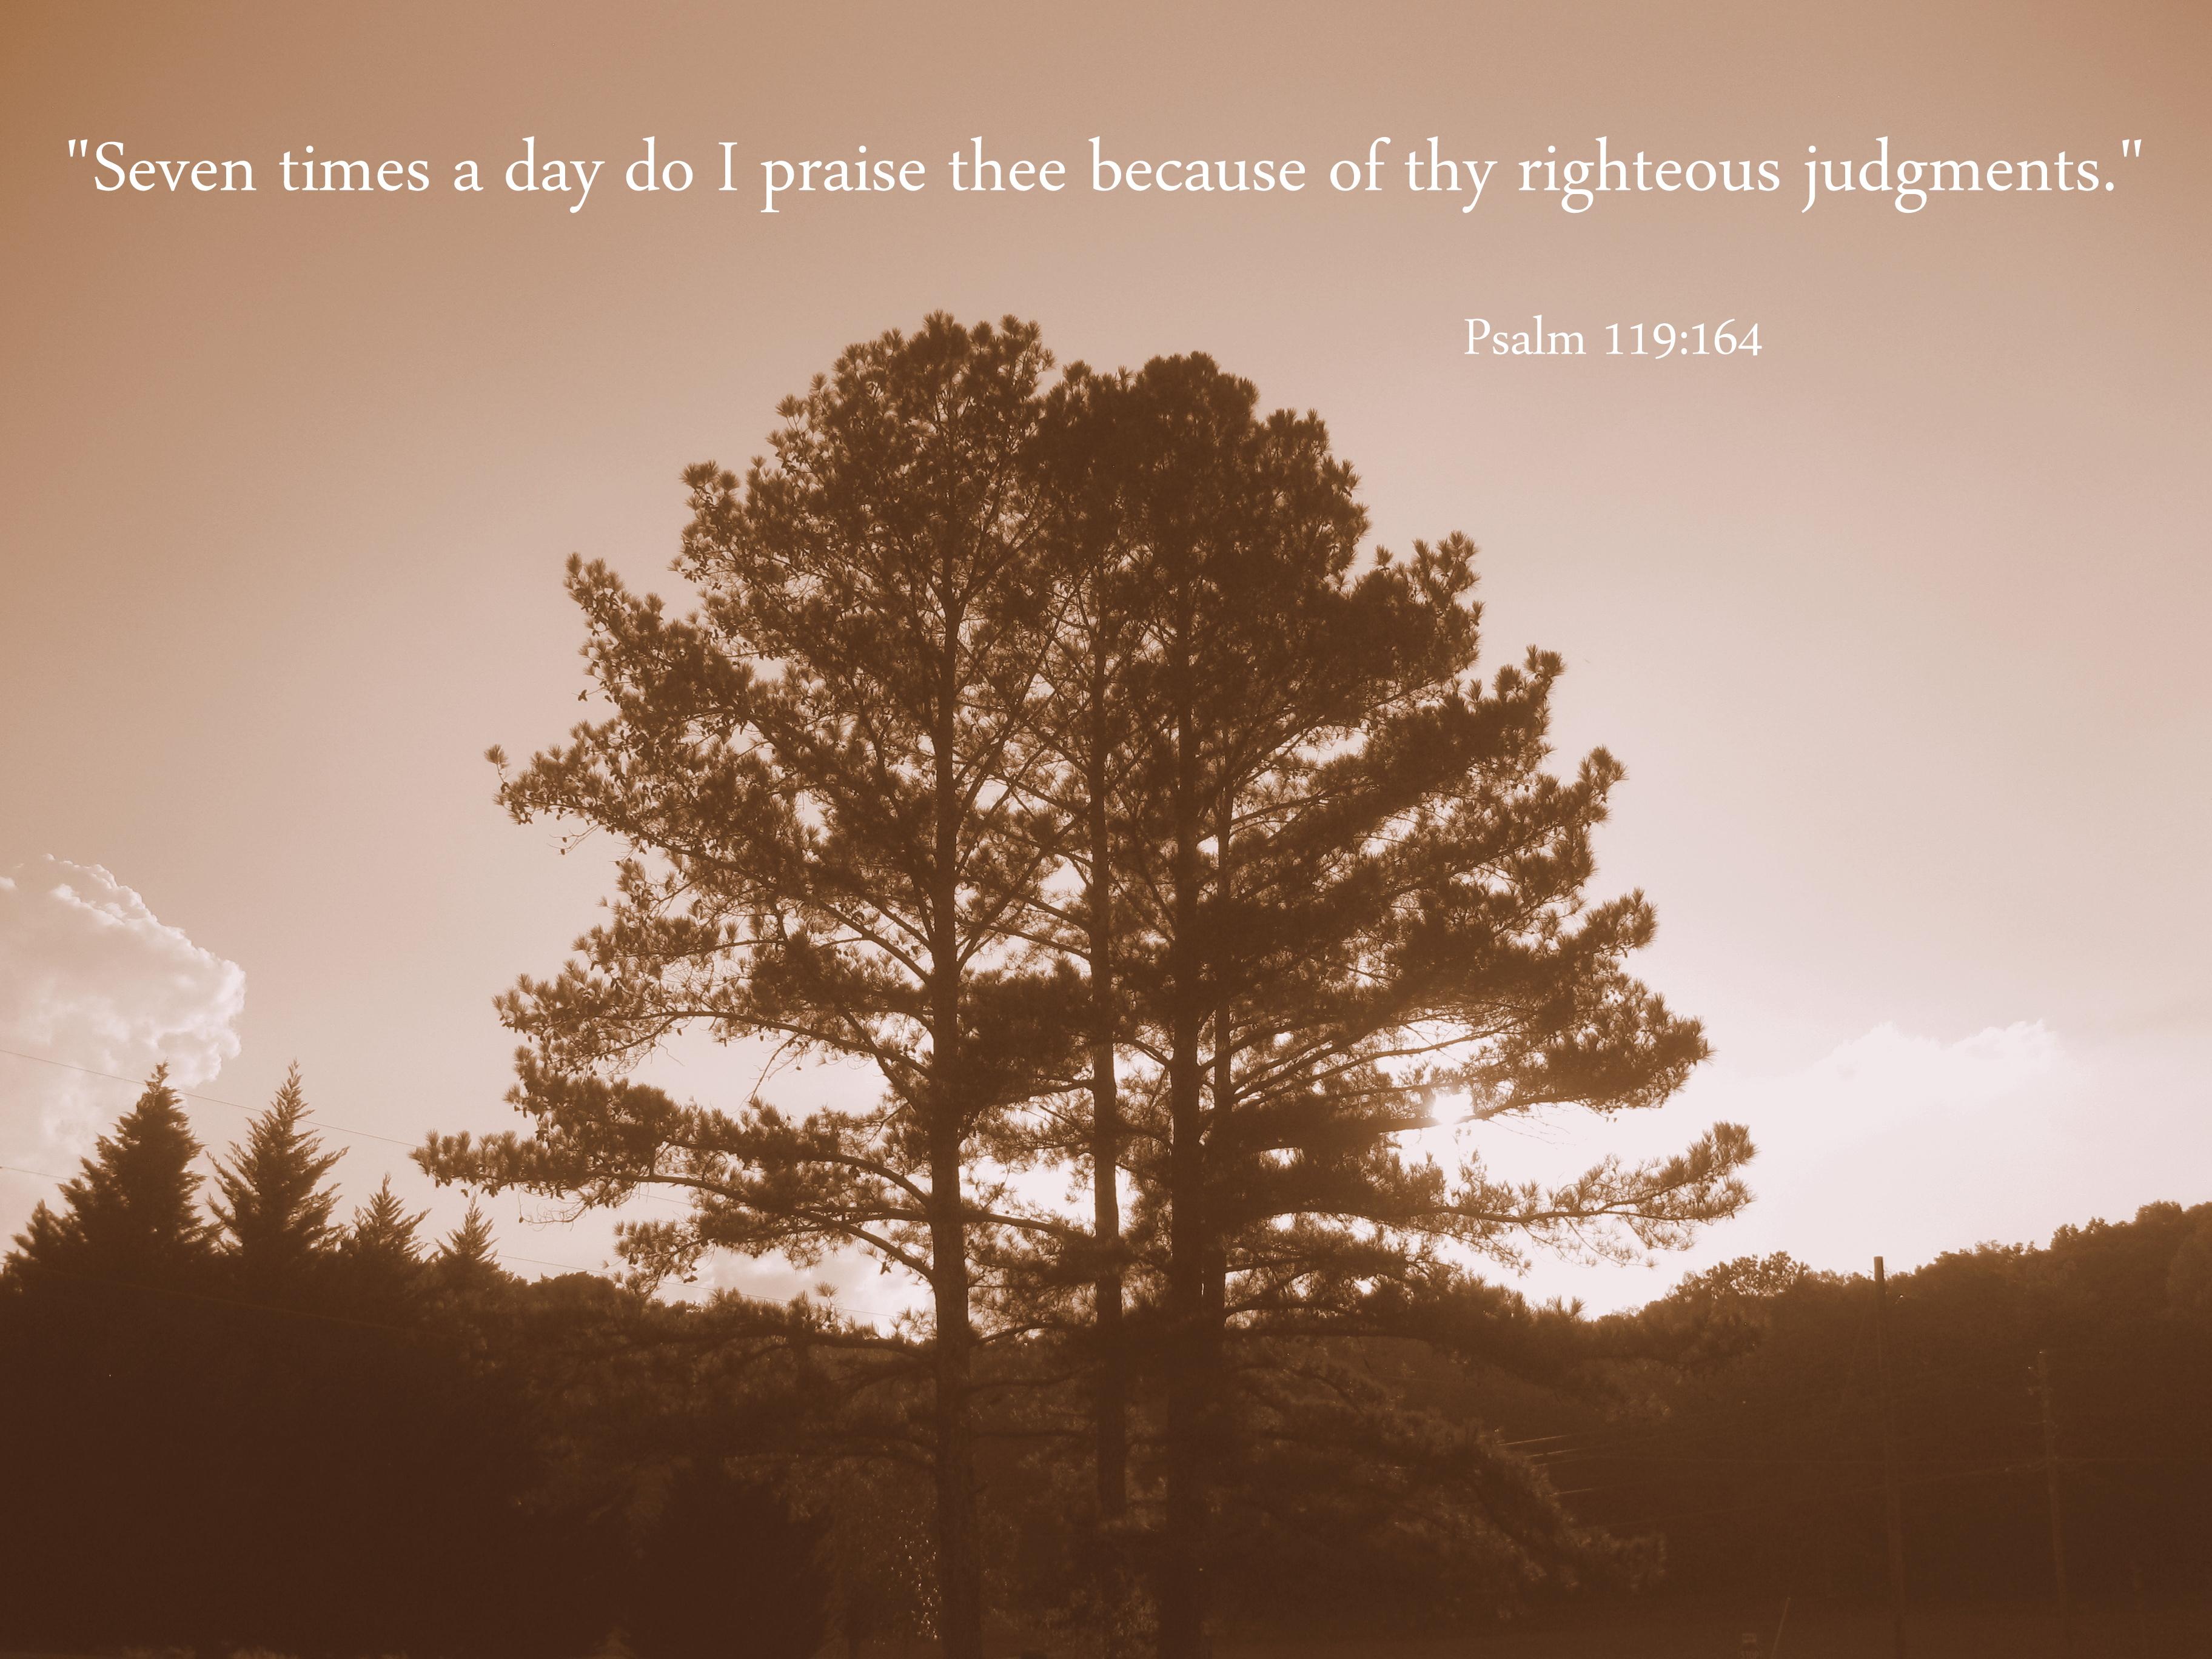 Psalm 119:164